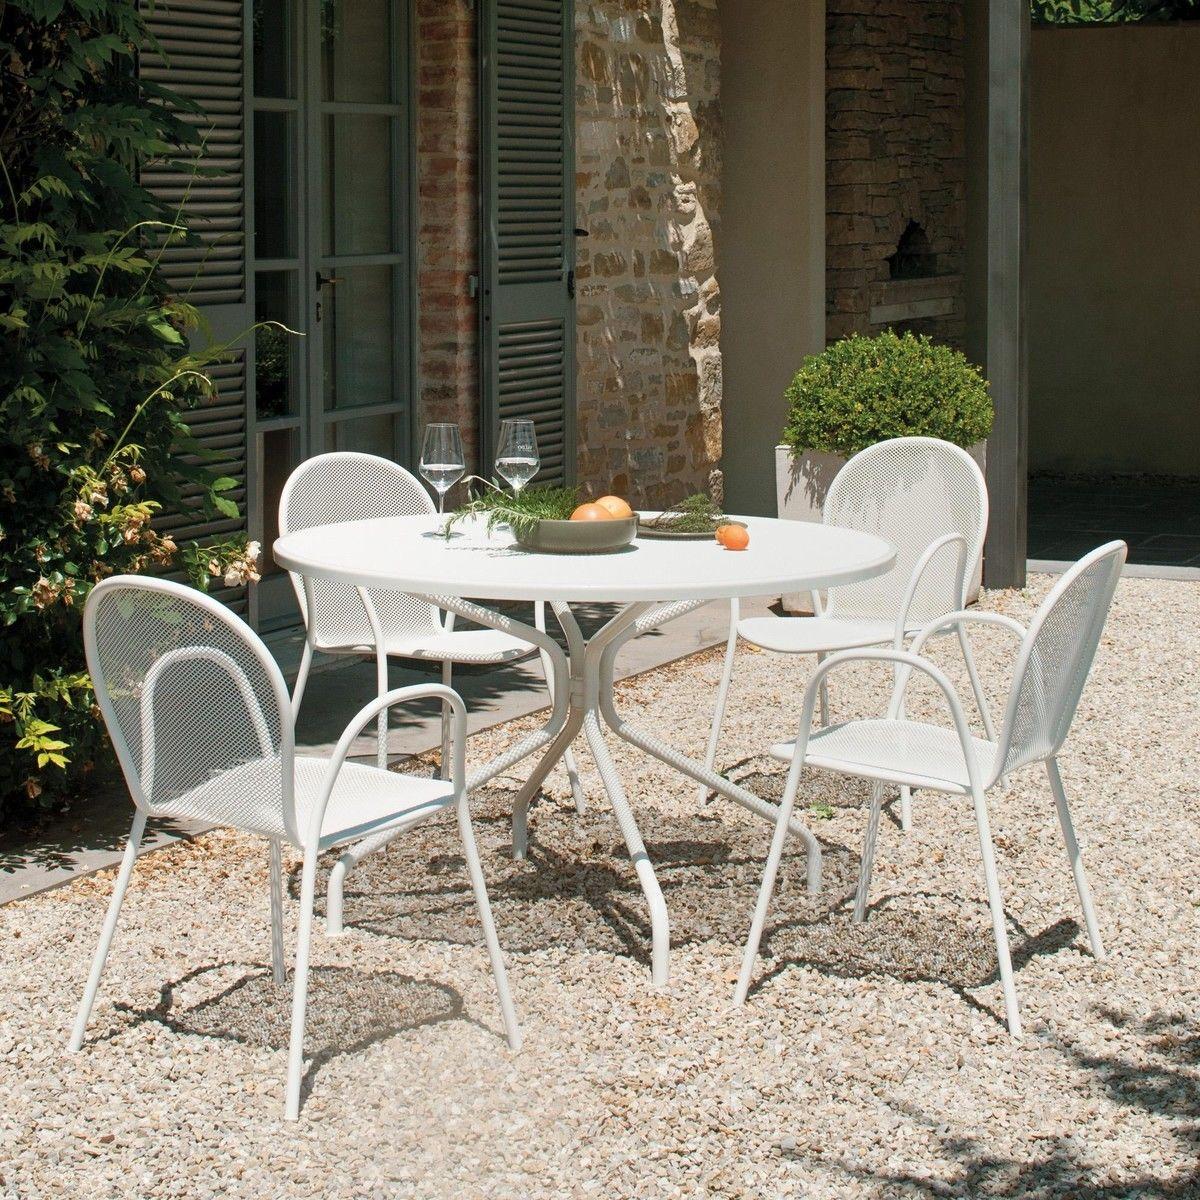 Chaises Jardin Emu | Jardin Emu Athena Mobilier Exterieur Emu Bain ...